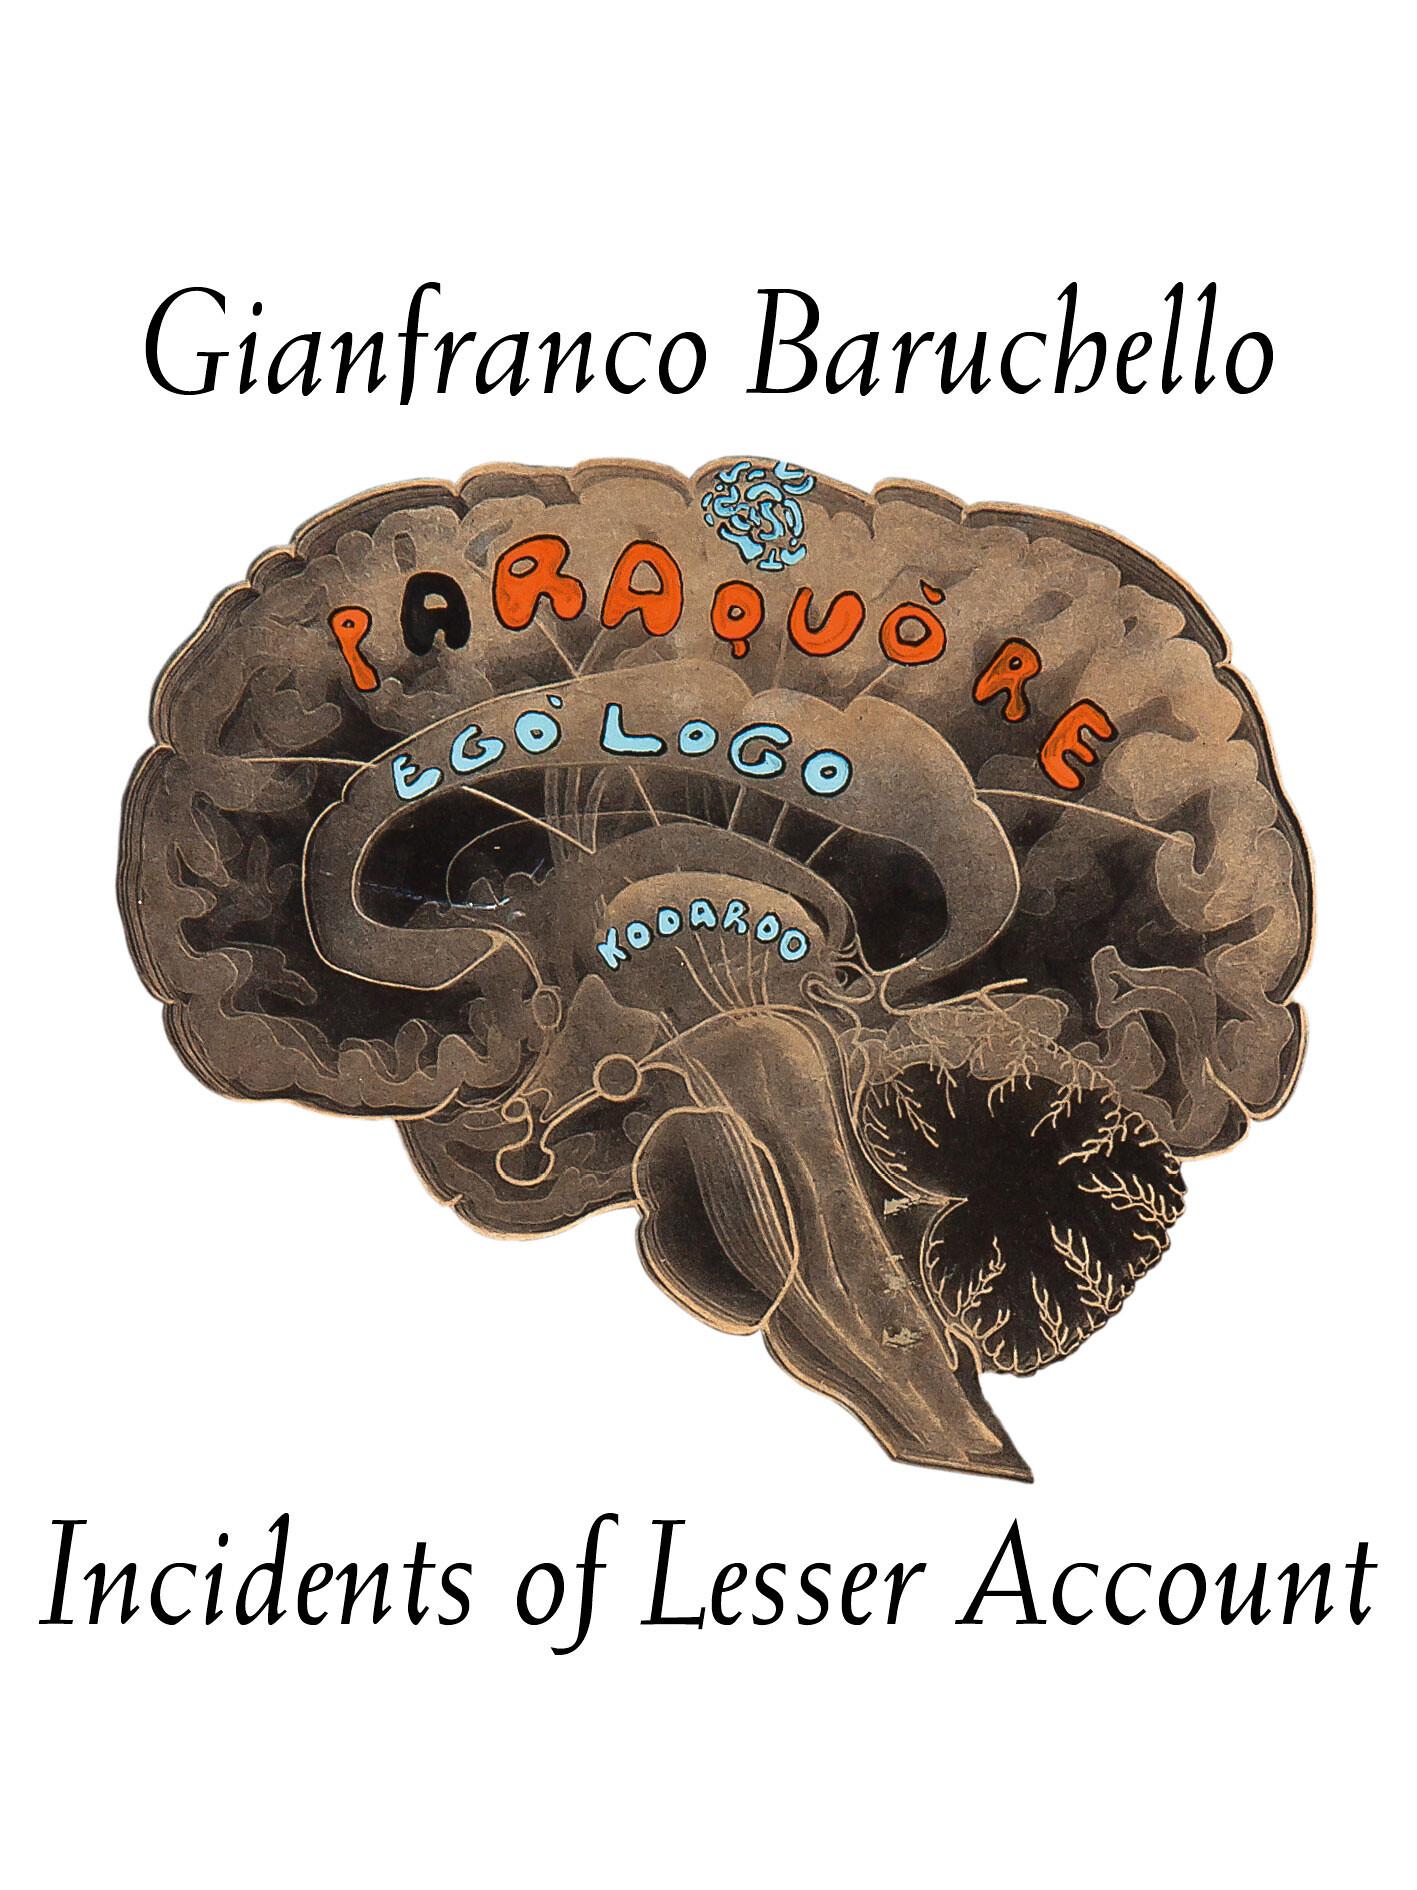 Gianfranco baruchello incidents of lesser account for Gianfranco baruchello